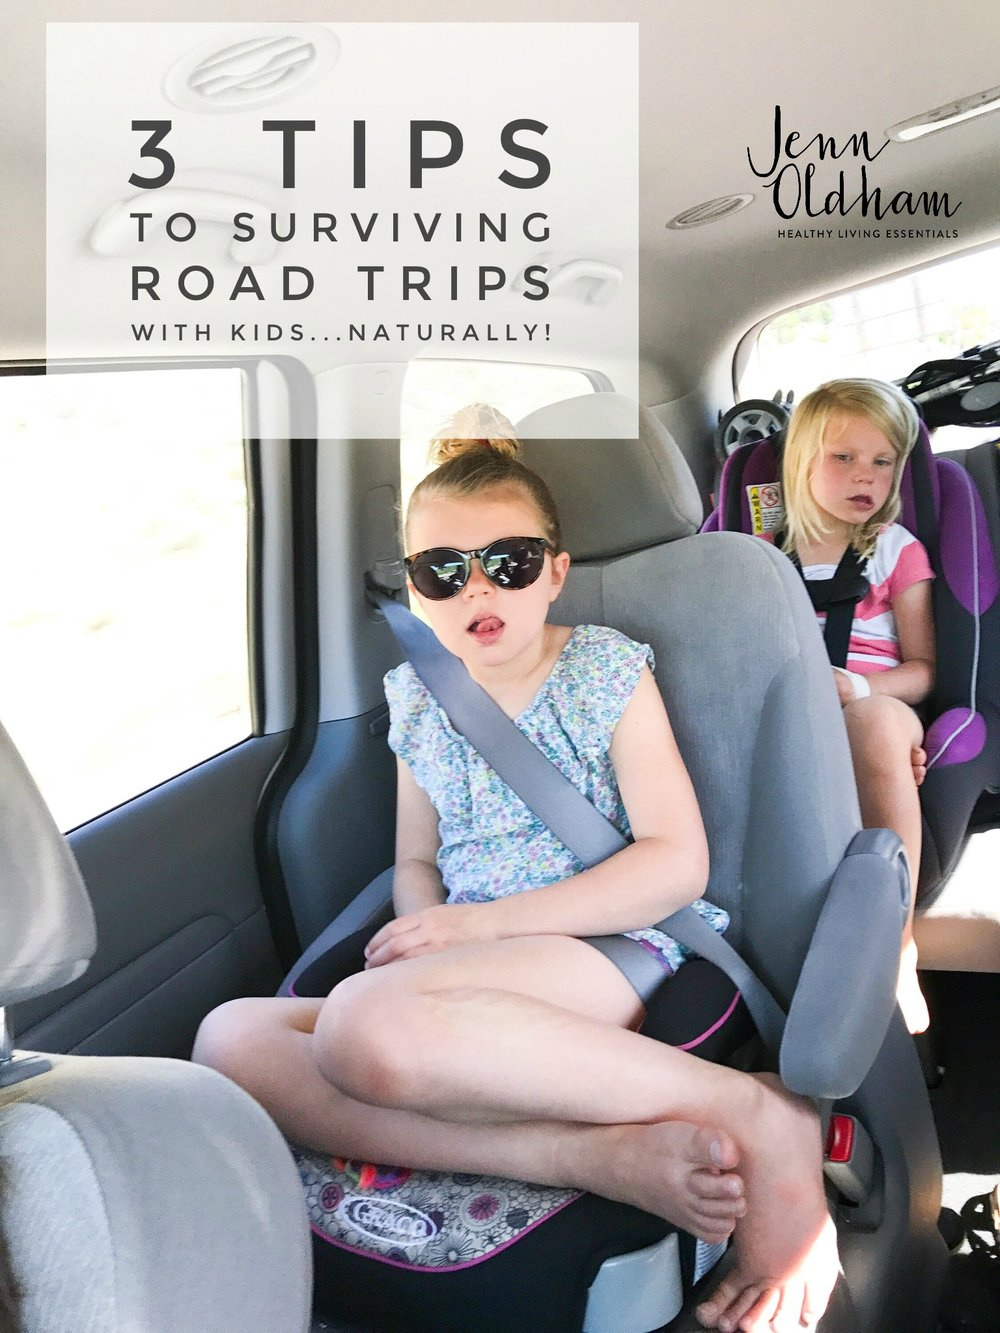 Tips+for+Road+Trips+with+Kids+-+Jenn+Oldham-min.jpg